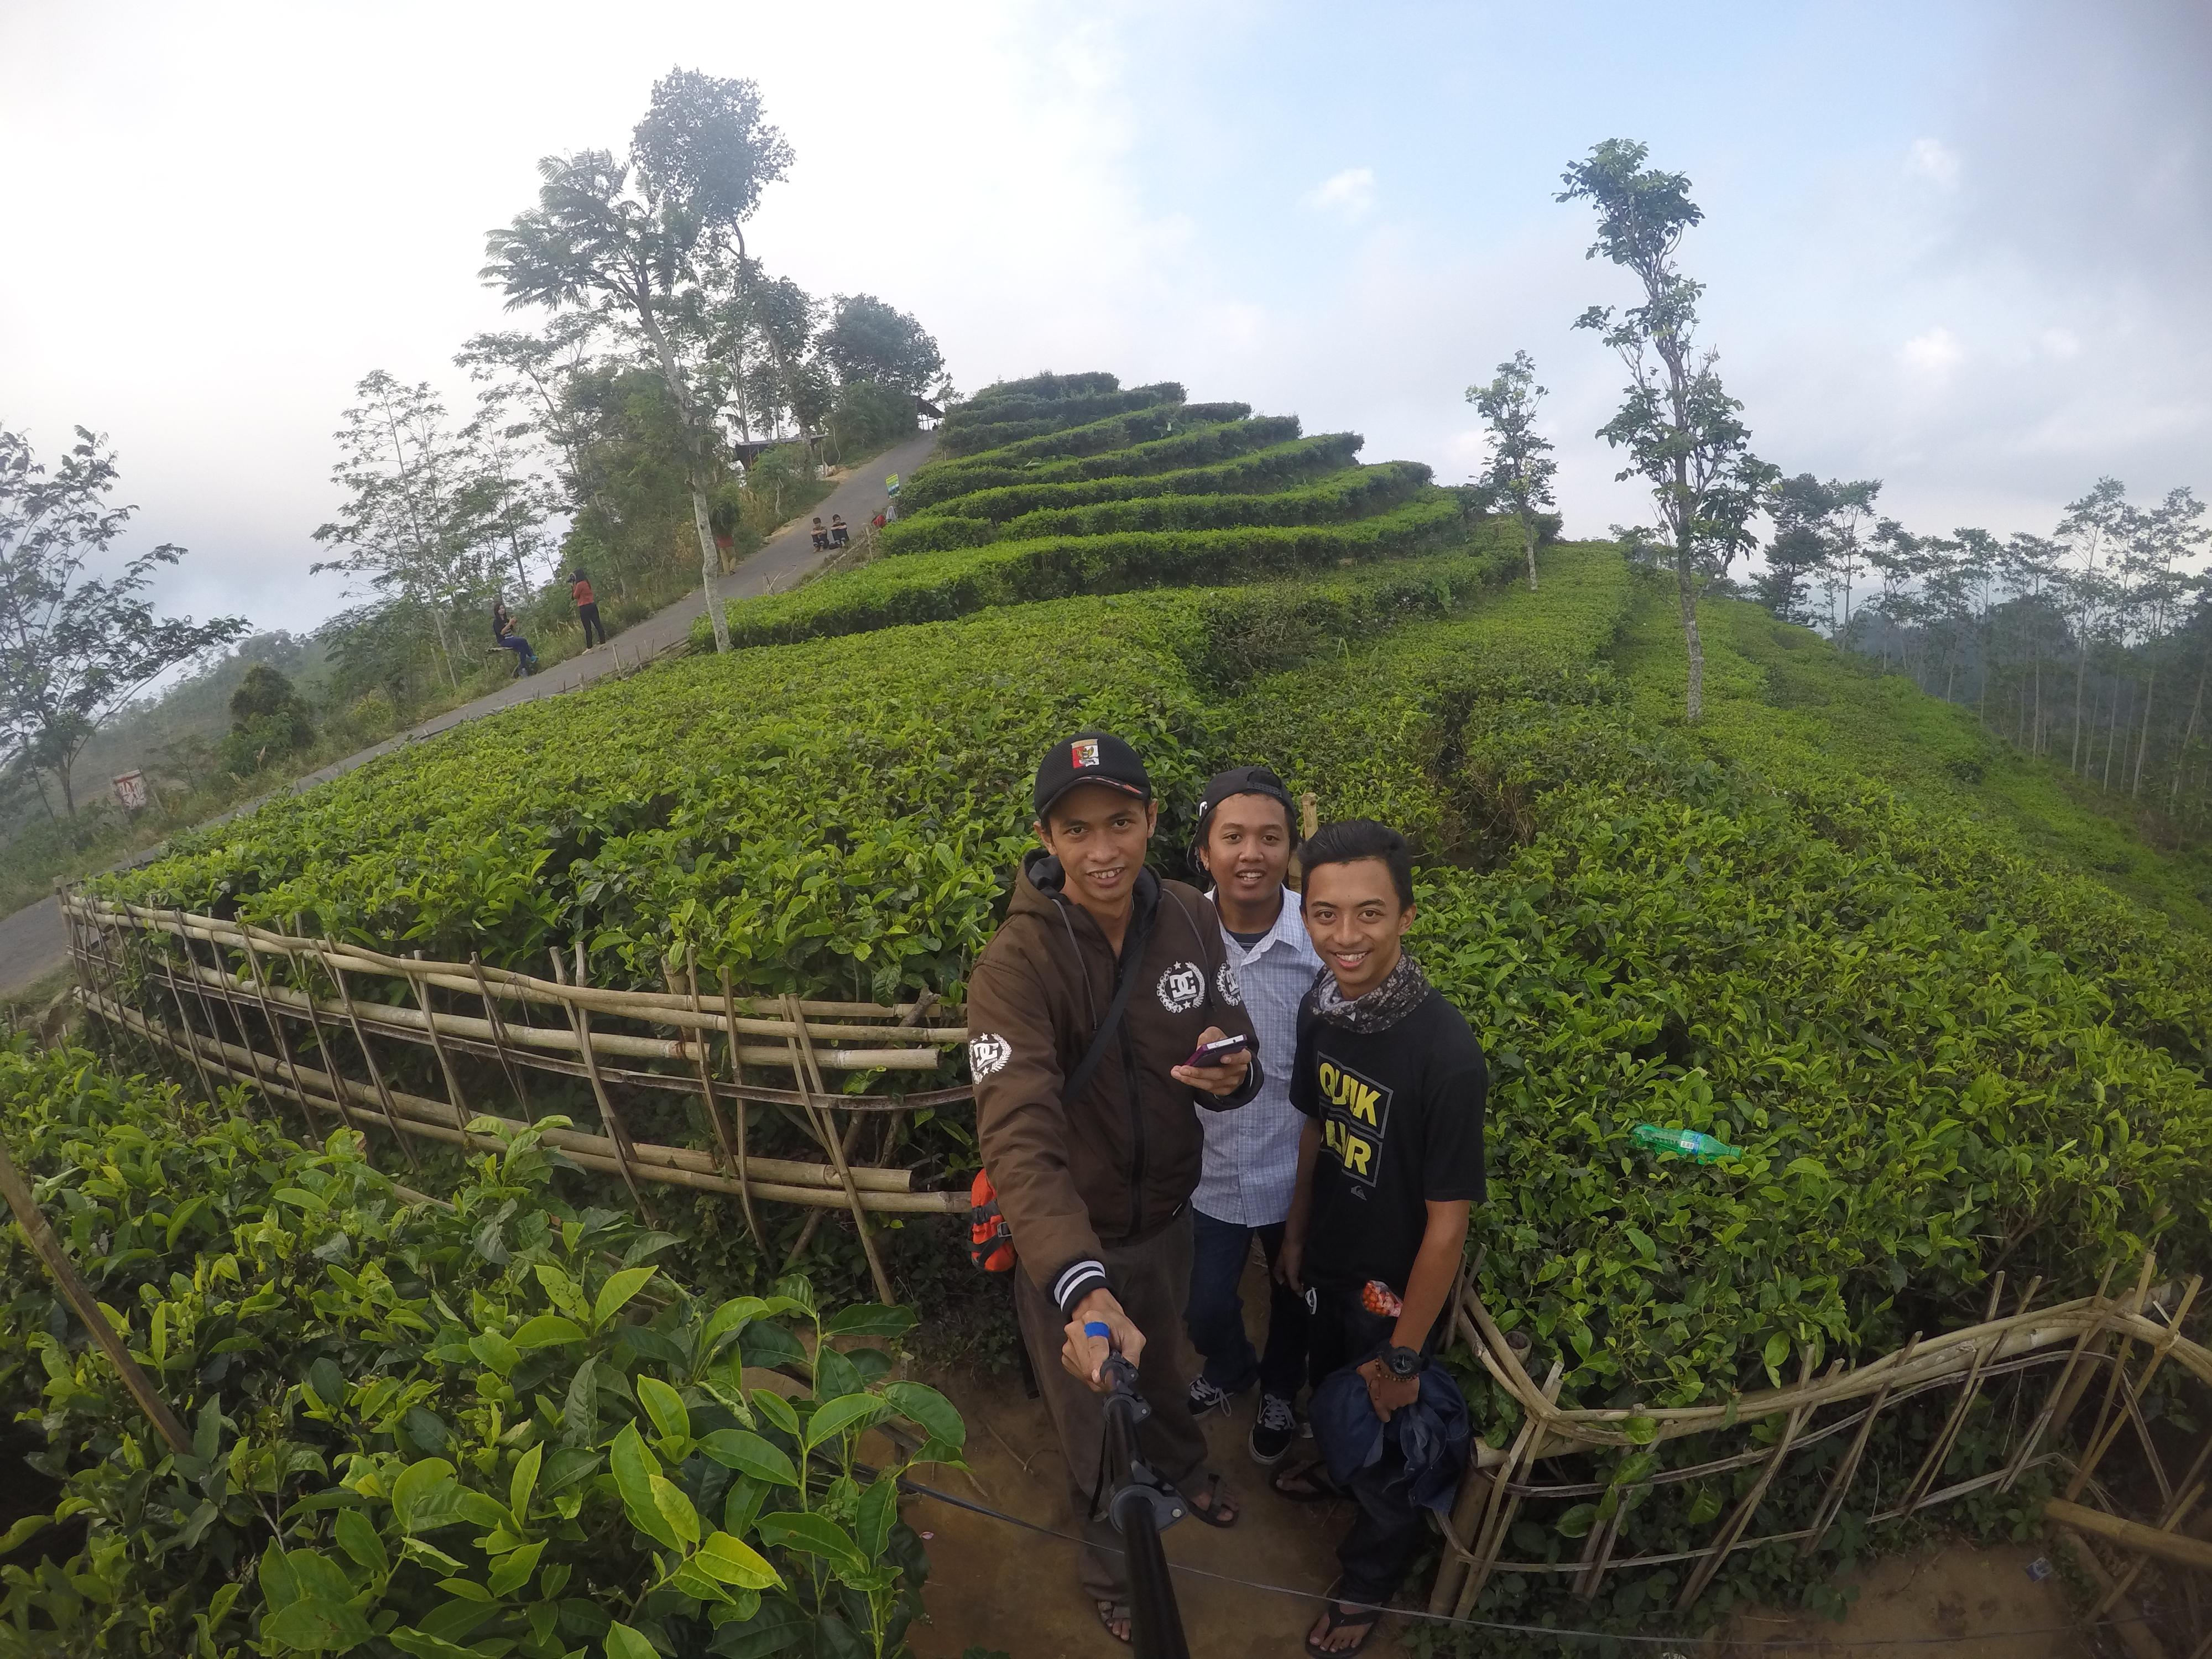 Wisata Kebun Teh Desa Nglinggo Kulon Progo Yogyakarta Singgahjogja Dcim100goprogopr3704